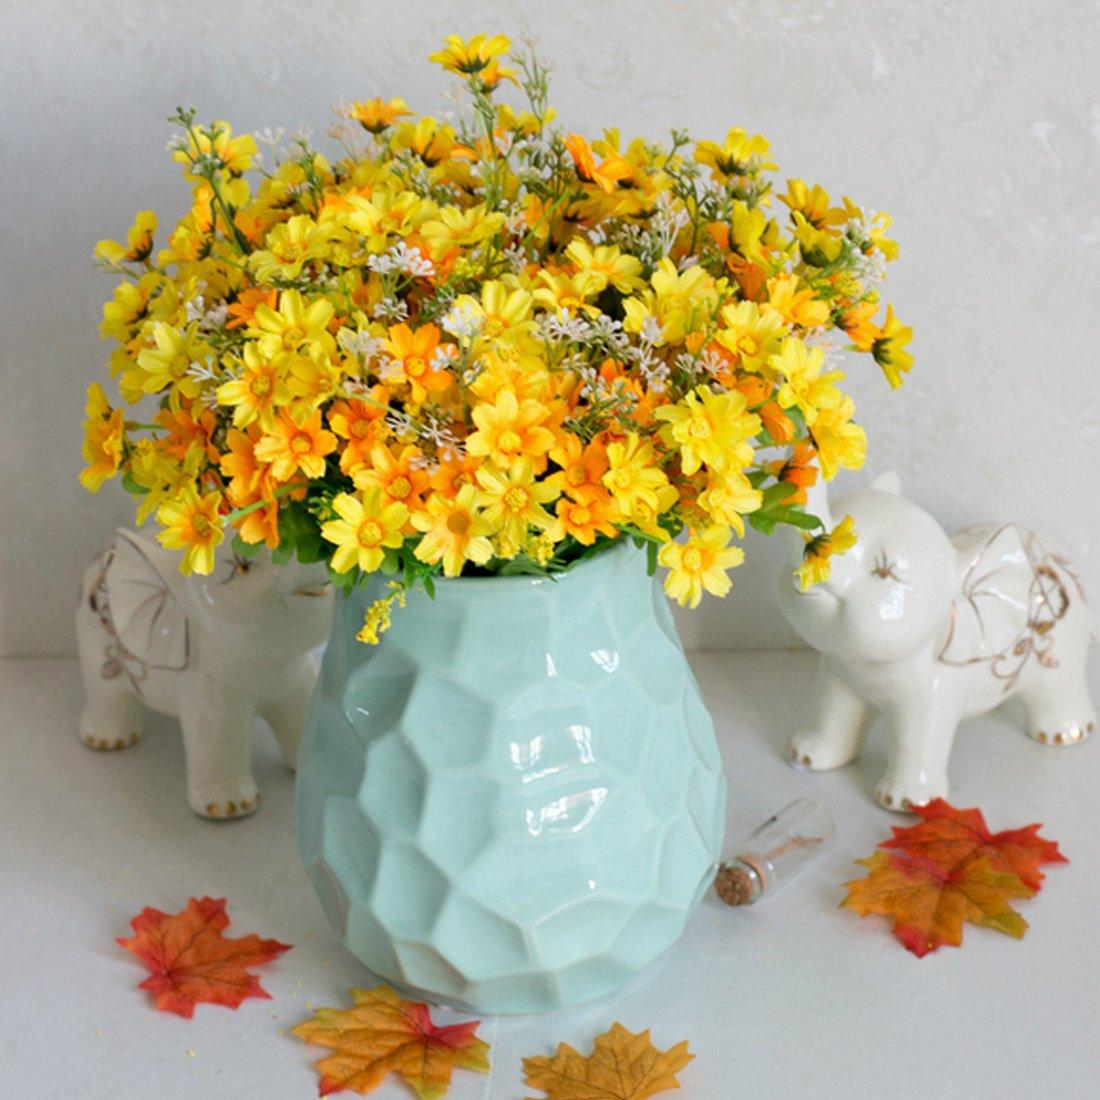 Luwu Store Silk Artificial Flowers 28 Heads Fake Daisy Flower For